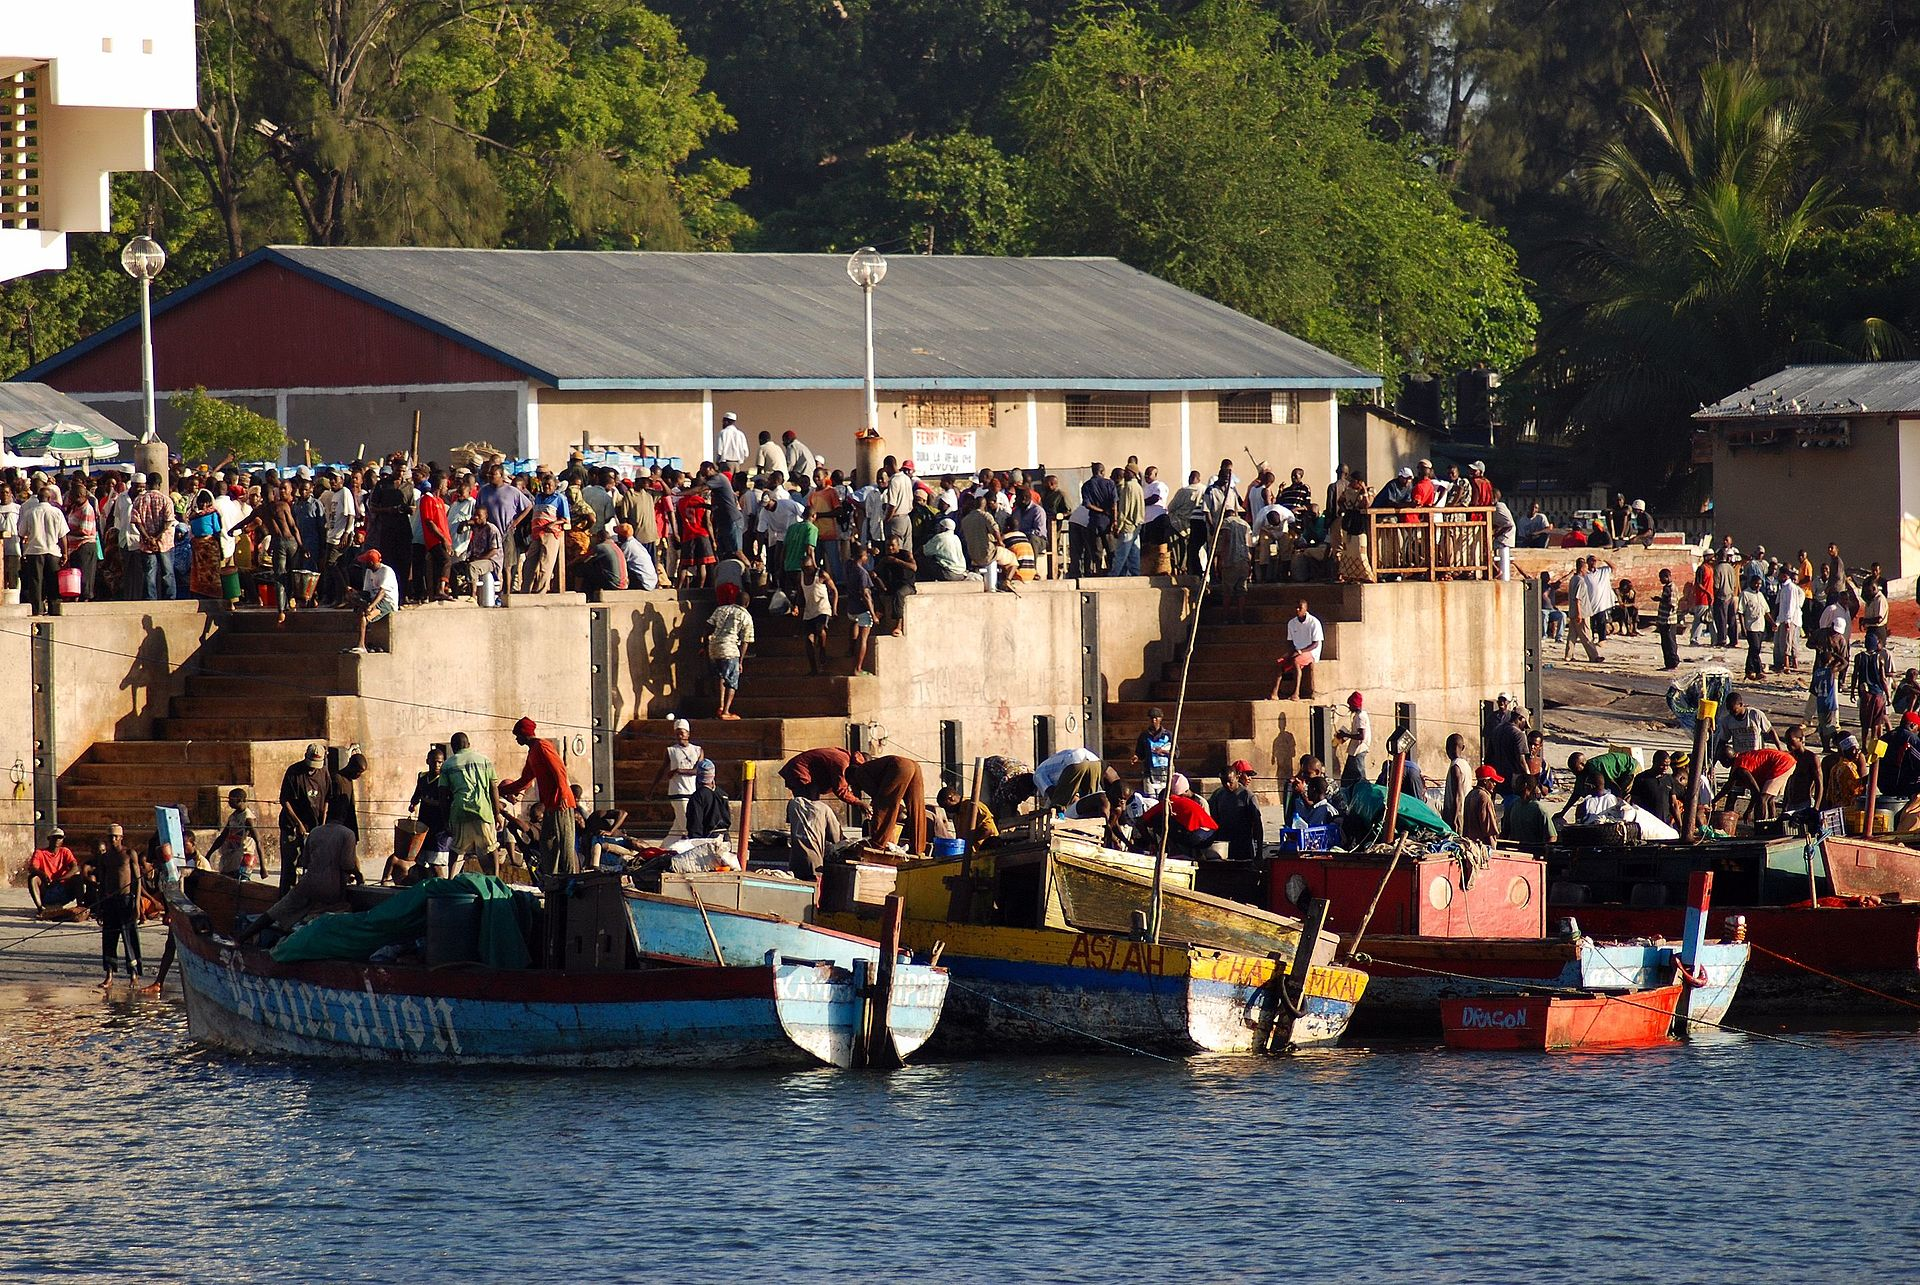 Kivukoni wikipedia for 3rd ferry fish market